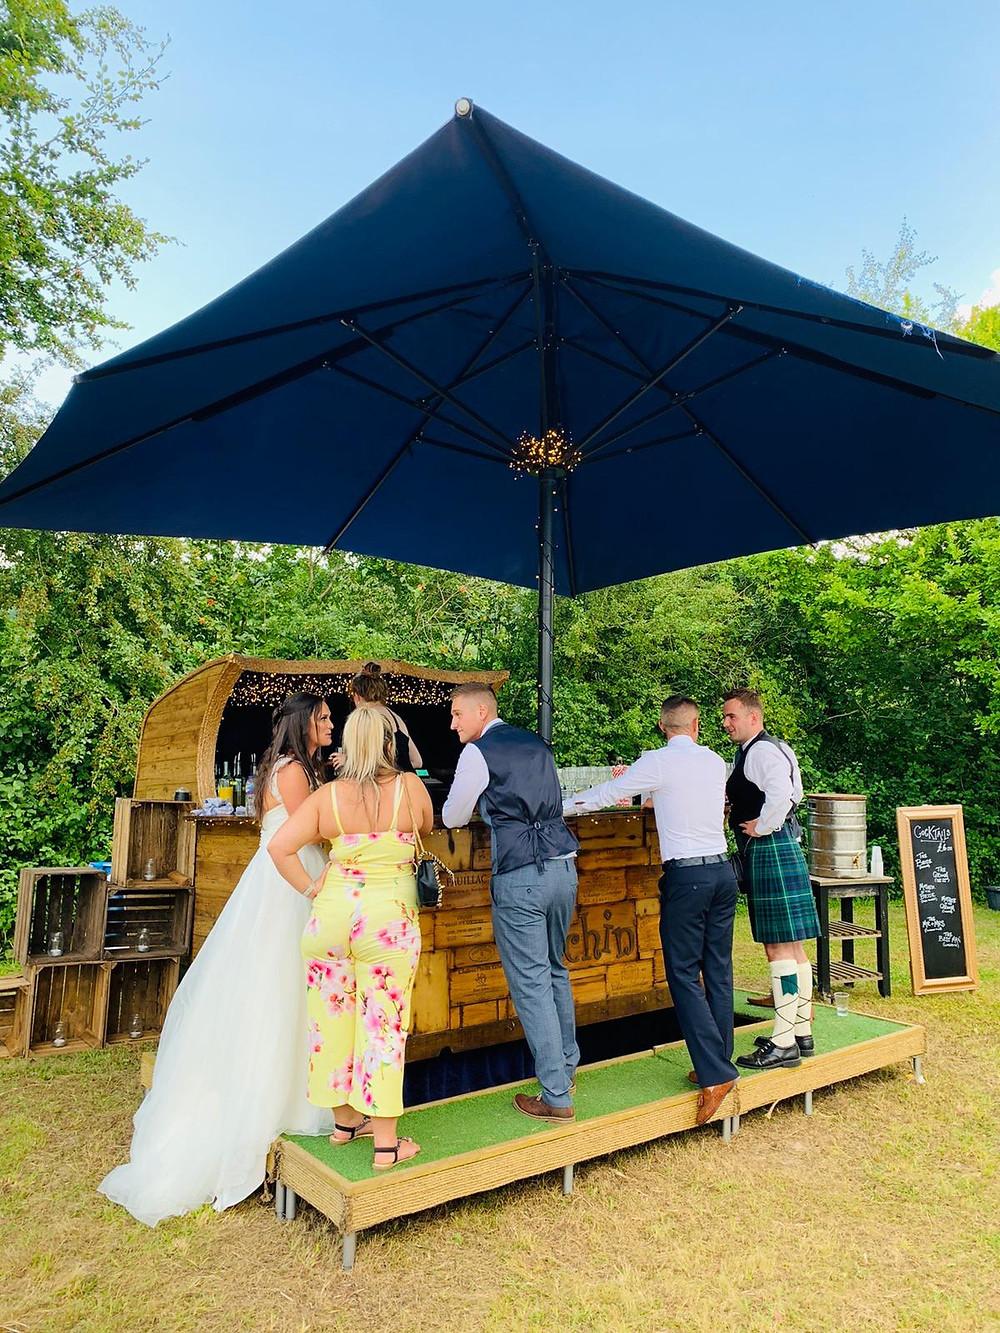 Chin Chin Caravan Bar at Adam & Lizzie's Marquee Wedding in Kent